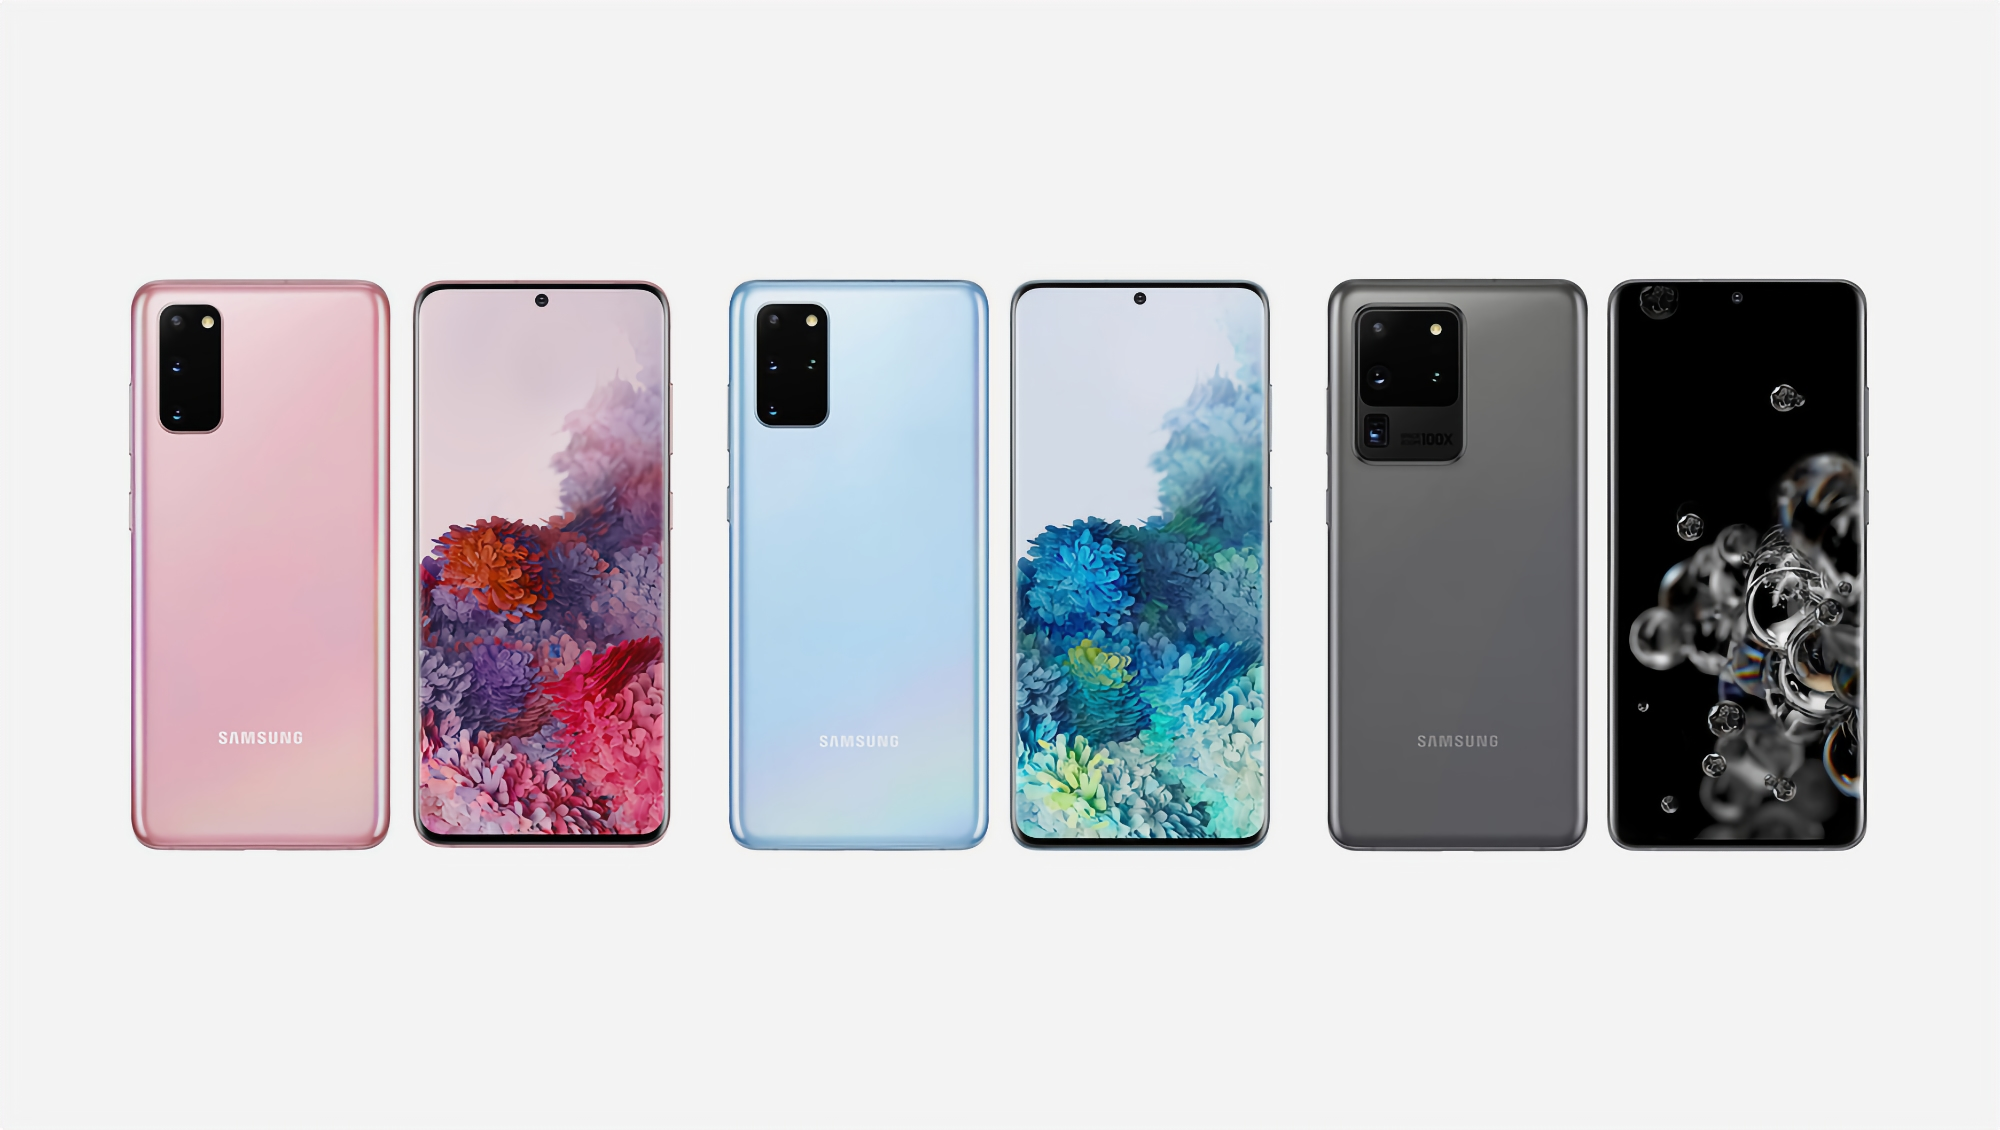 Samsung выпустила обновление One UI 3.1.1 для Galaxy S10, Galaxy S20, Galaxy Note 10 и Galaxy Note 20